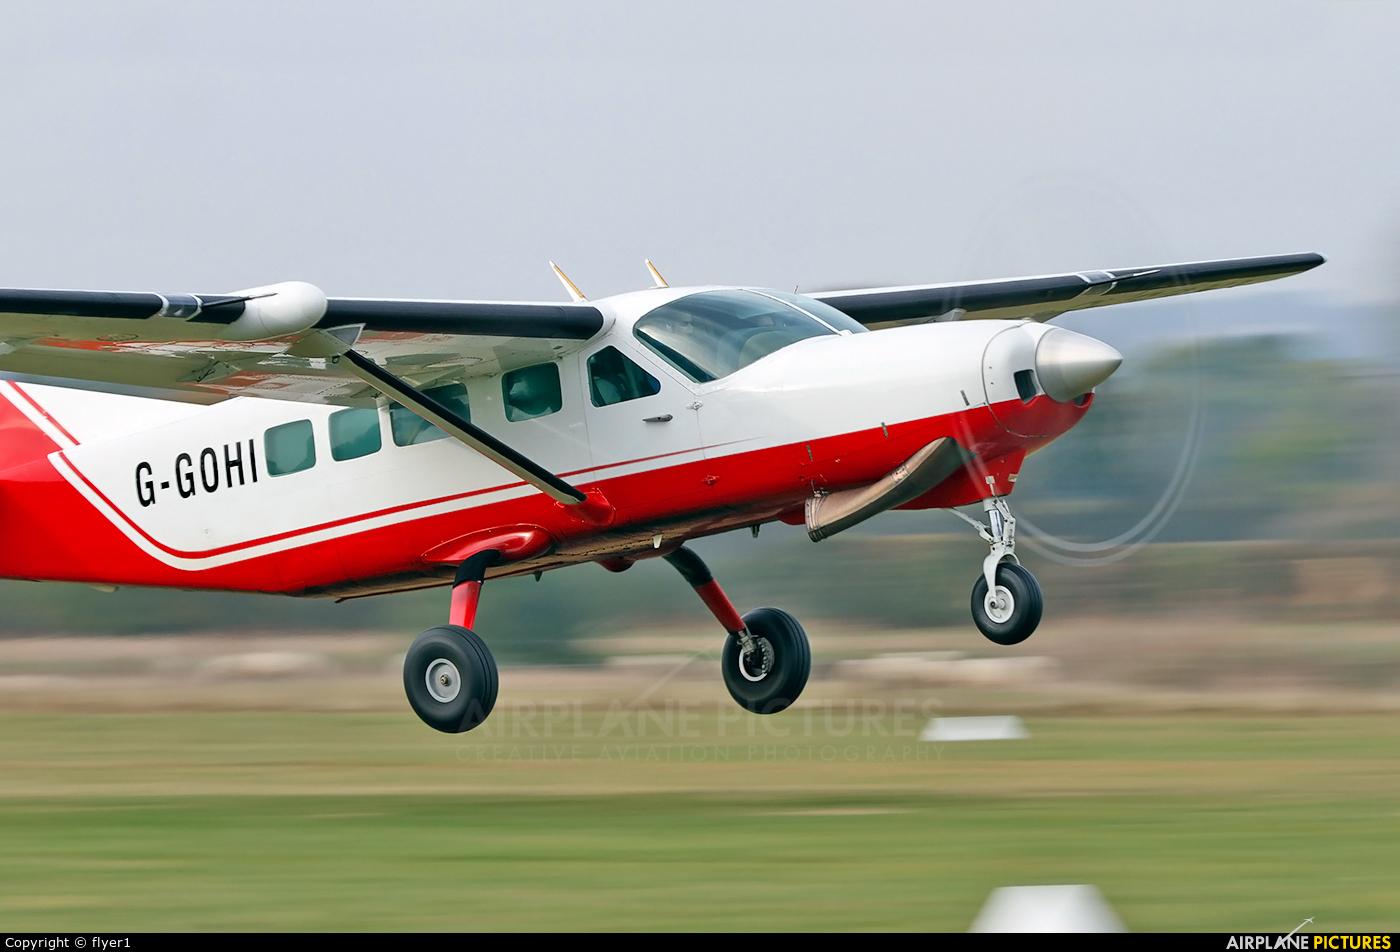 Private G-GOHI aircraft at Lashenden / Headcorn